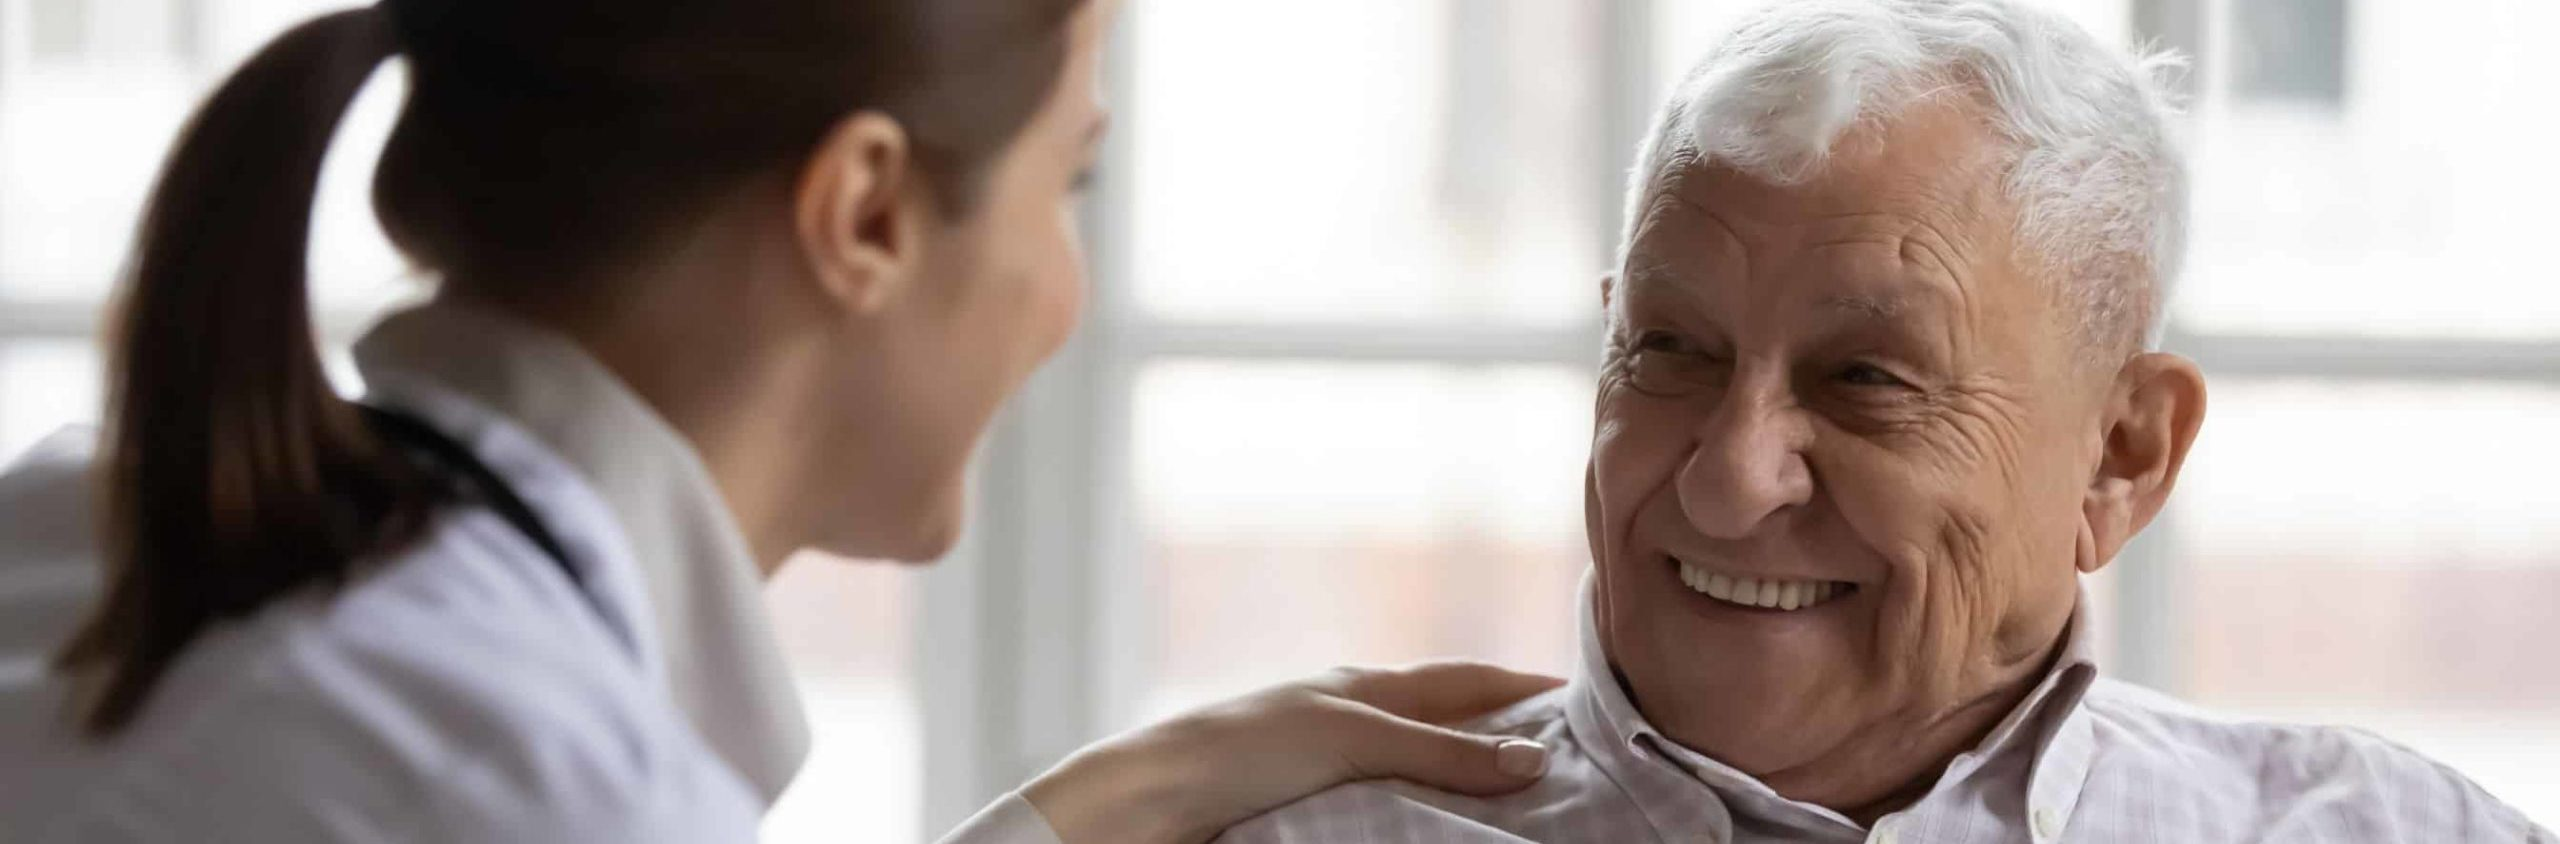 Nurse treating elderly man